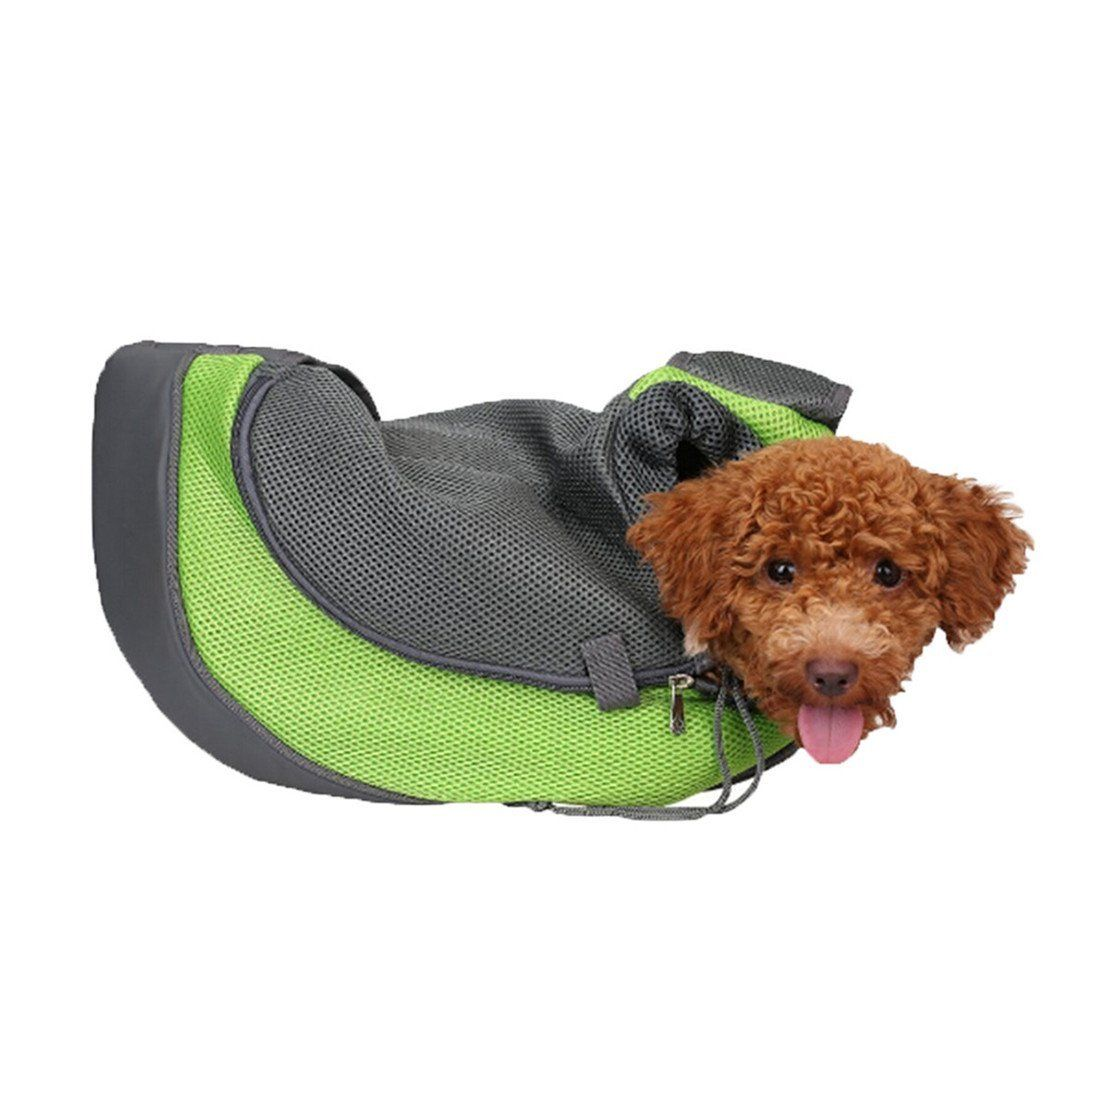 Edtoy Green Pet Dog Cat Puppy Kitten Travel Portable Bag